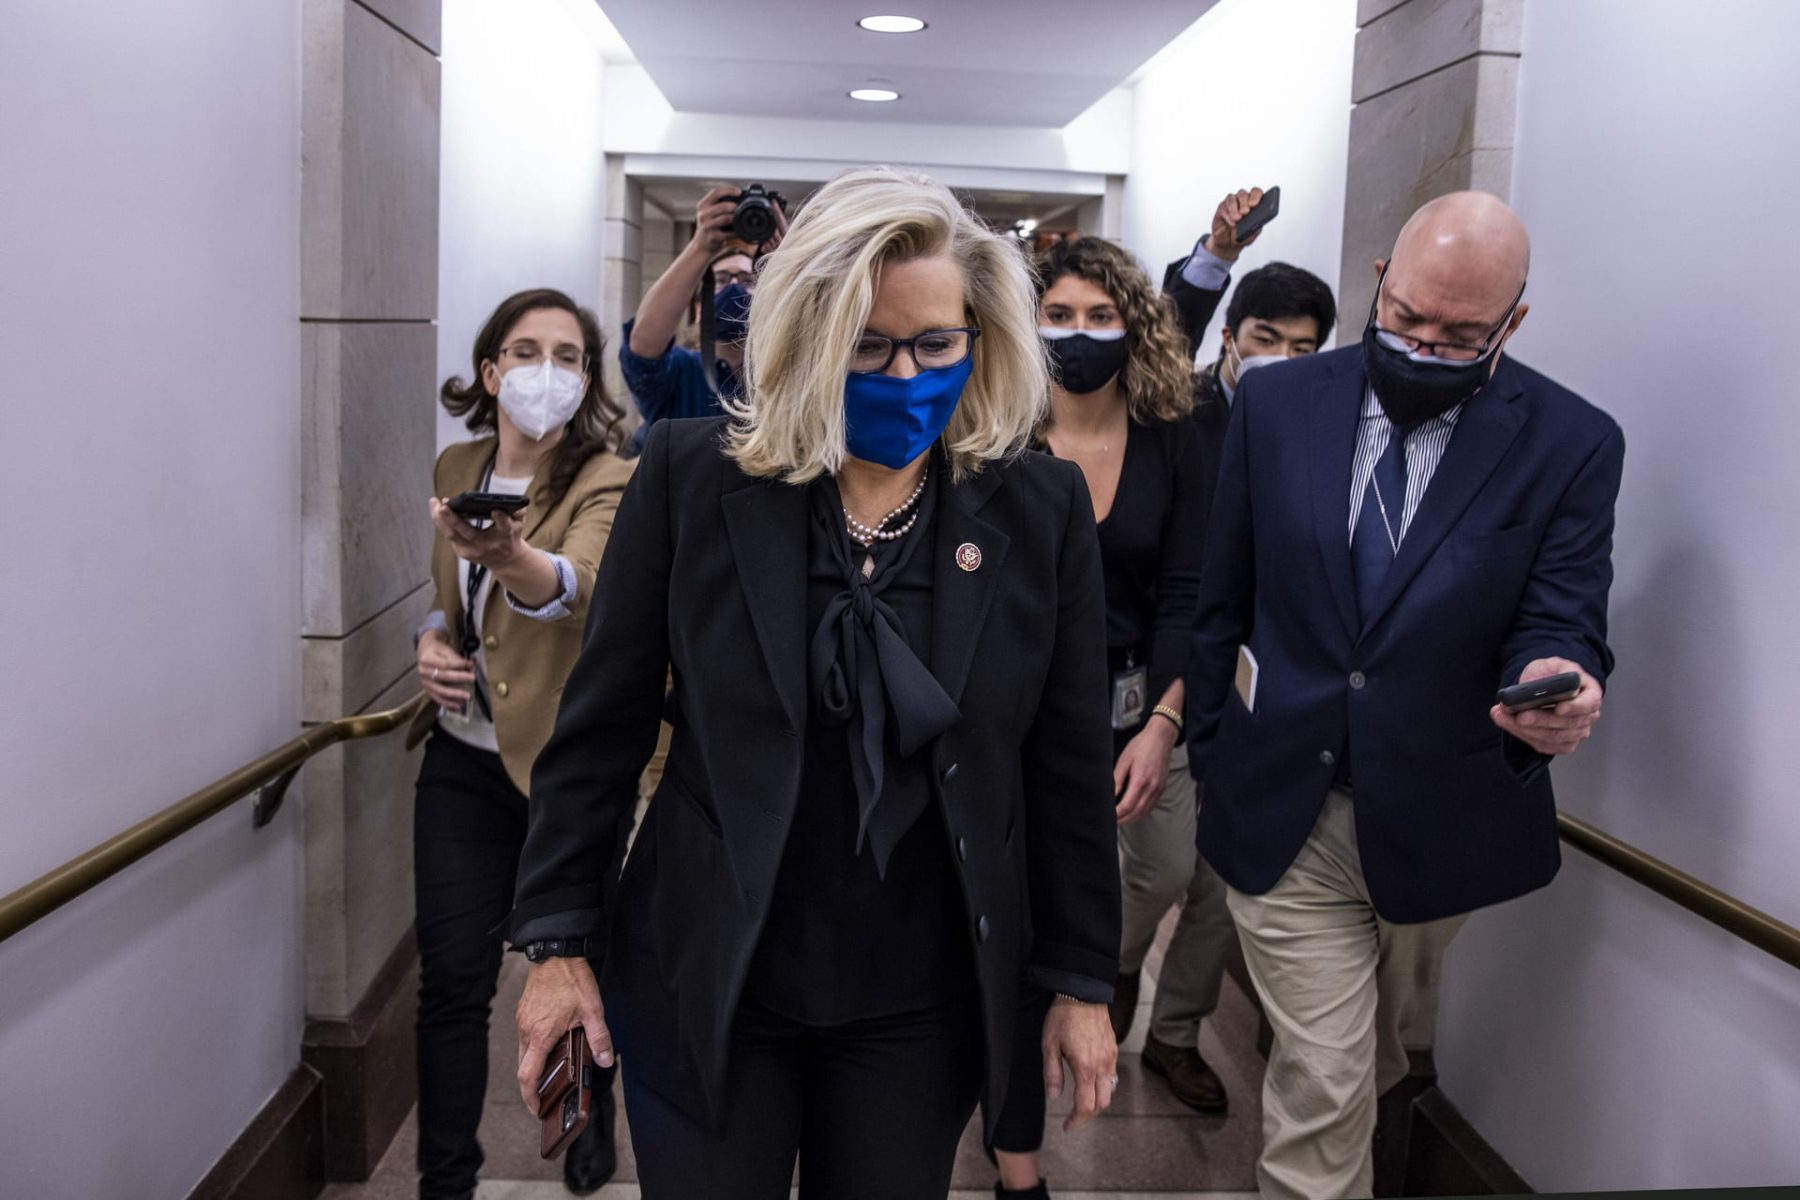 Liz Cheney walks to the House floor to vote on Feb. 3, 2021.